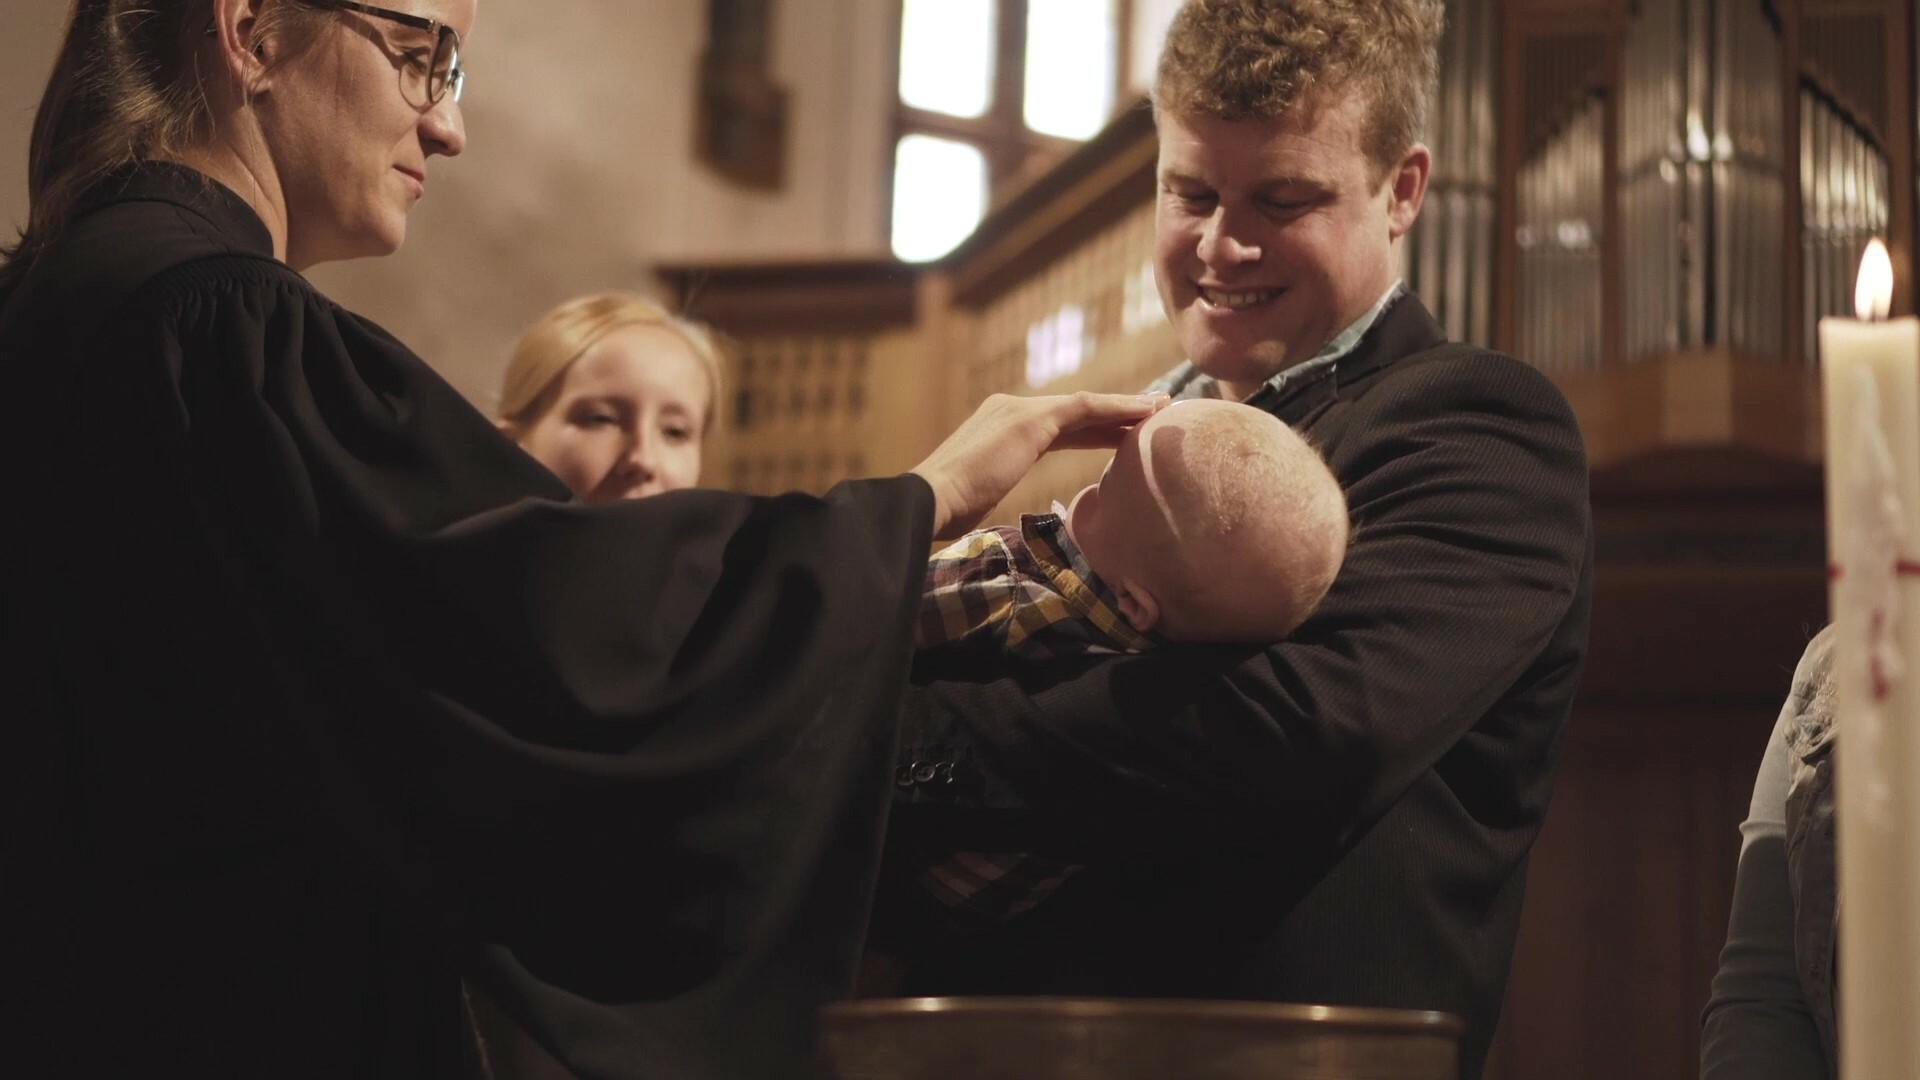 Reformierte kirche clip 02 Taufe 4sek Moment